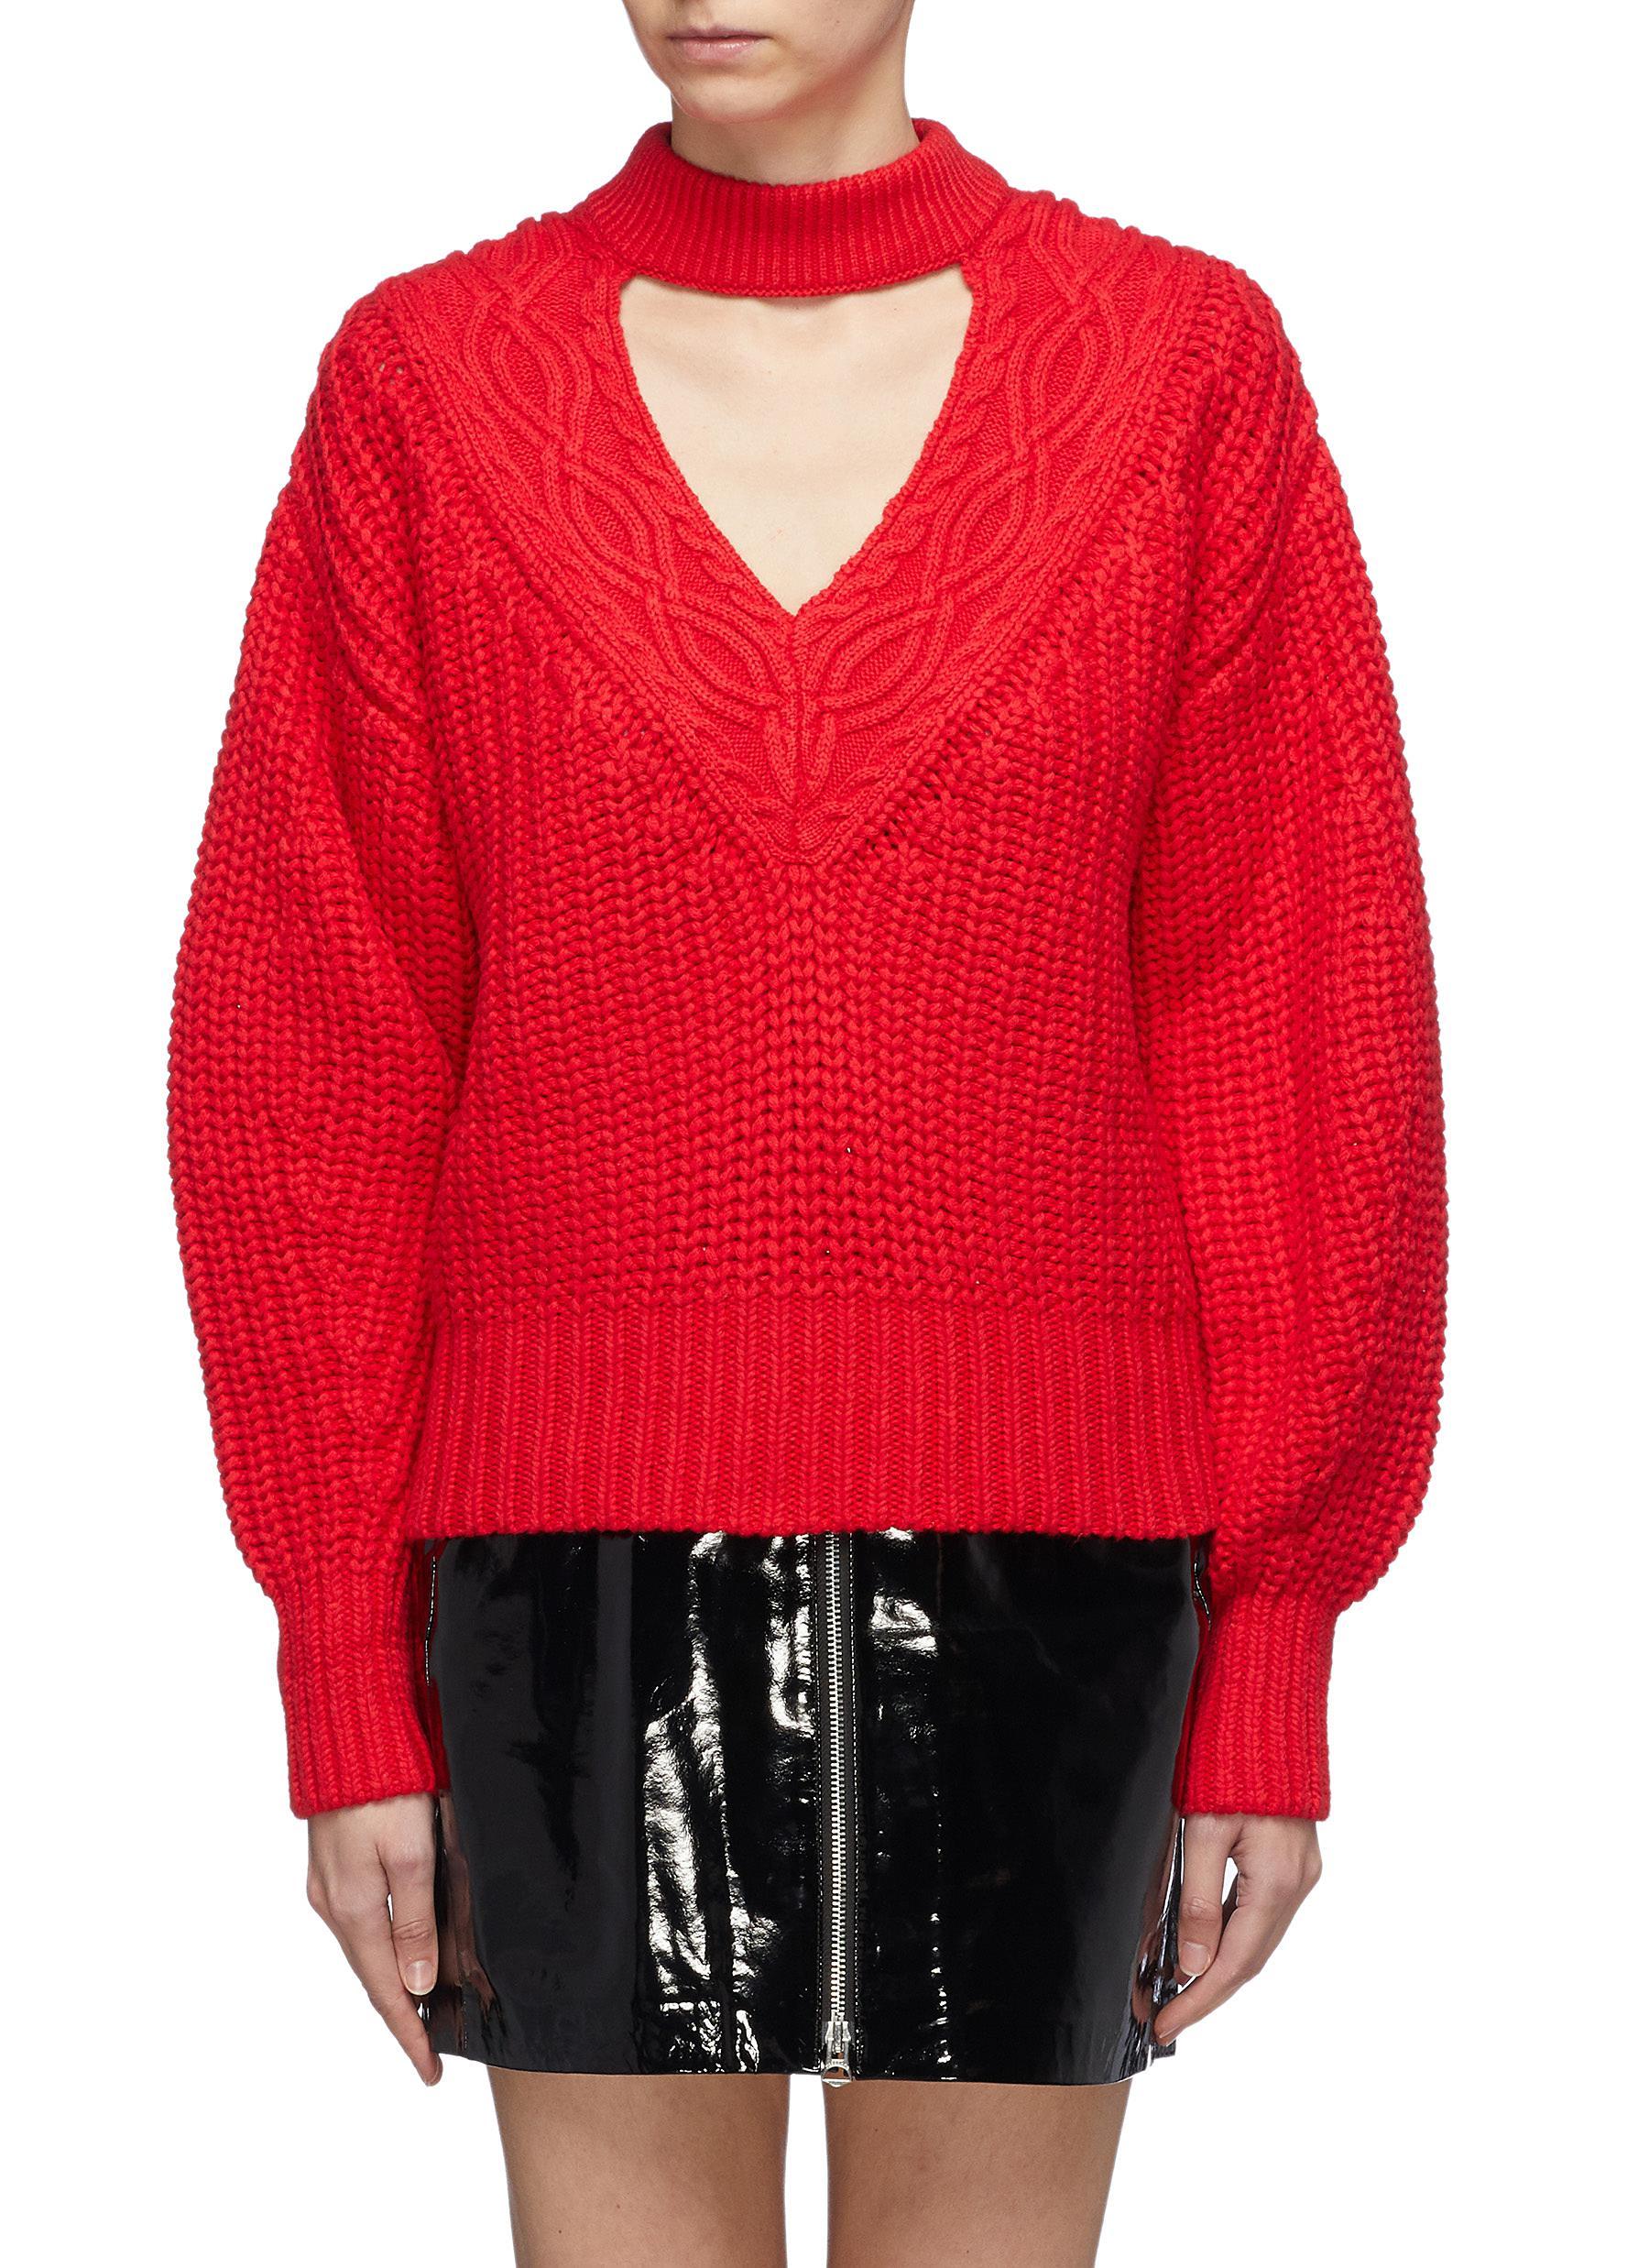 SELF-PORTRAIT Cutout V-neck cotton-wool mix knit sweater